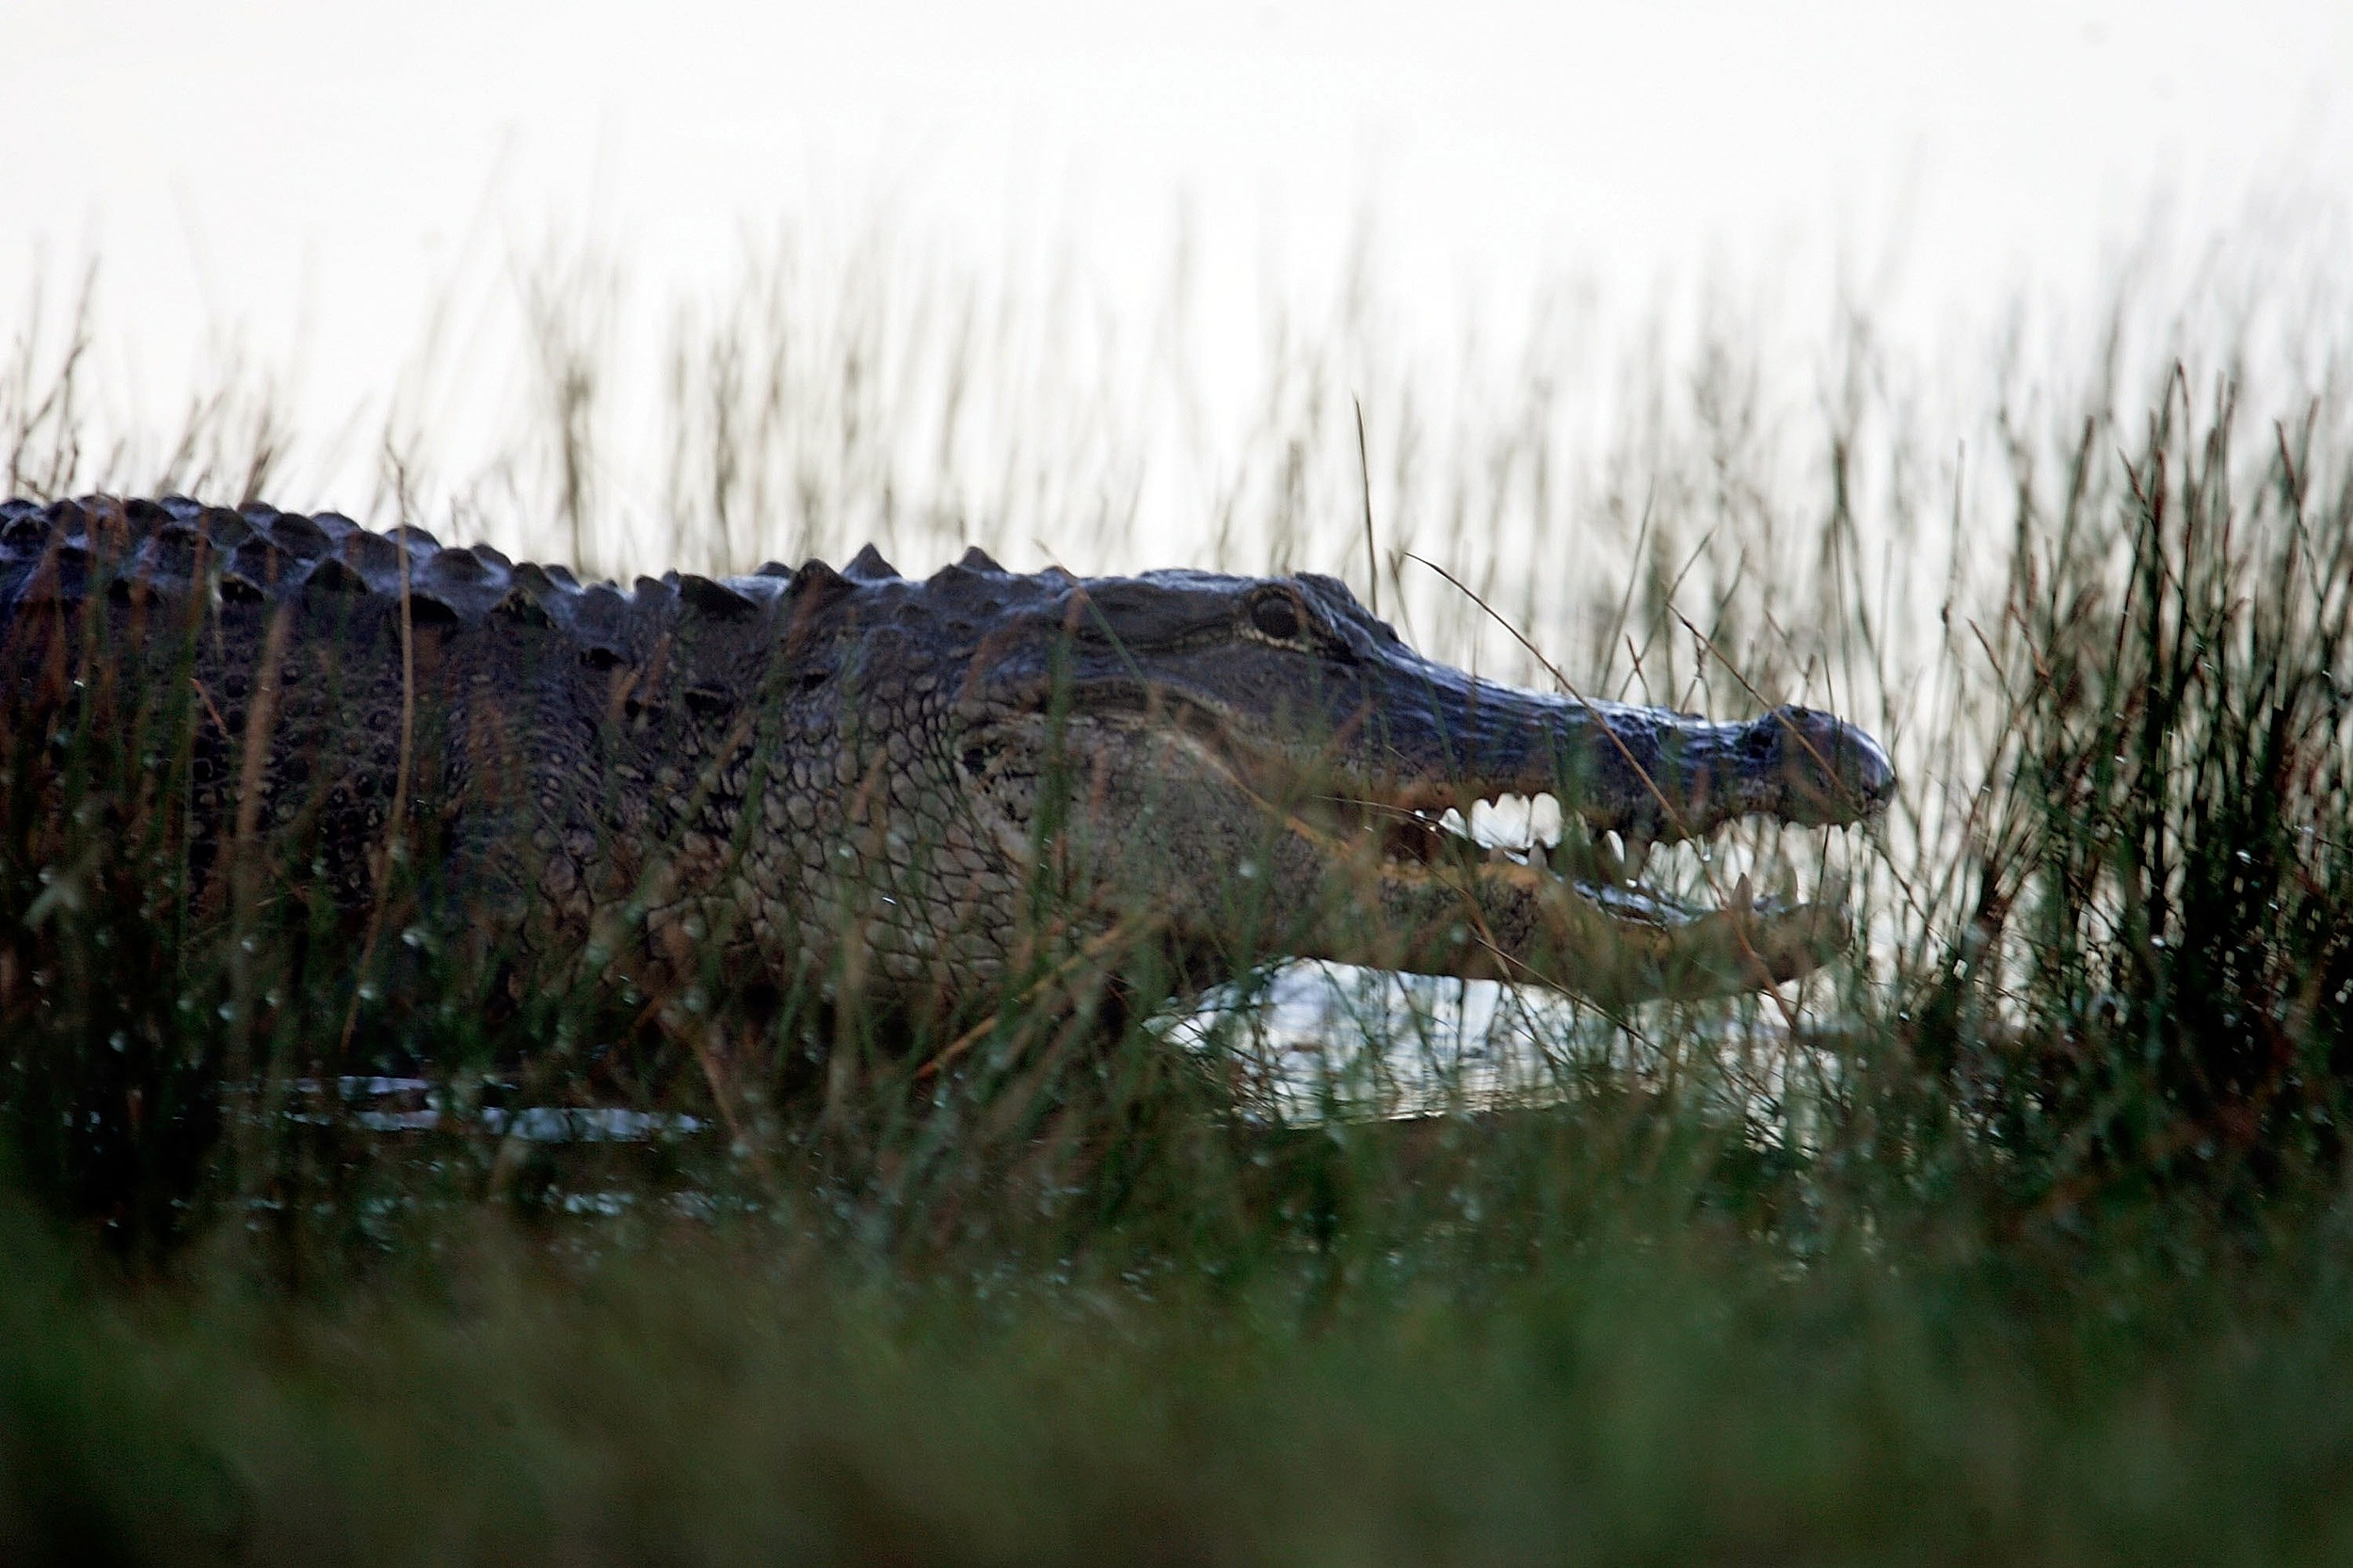 Huge Gator shuts down Caino Traffic in lake Charles (Getty Images)